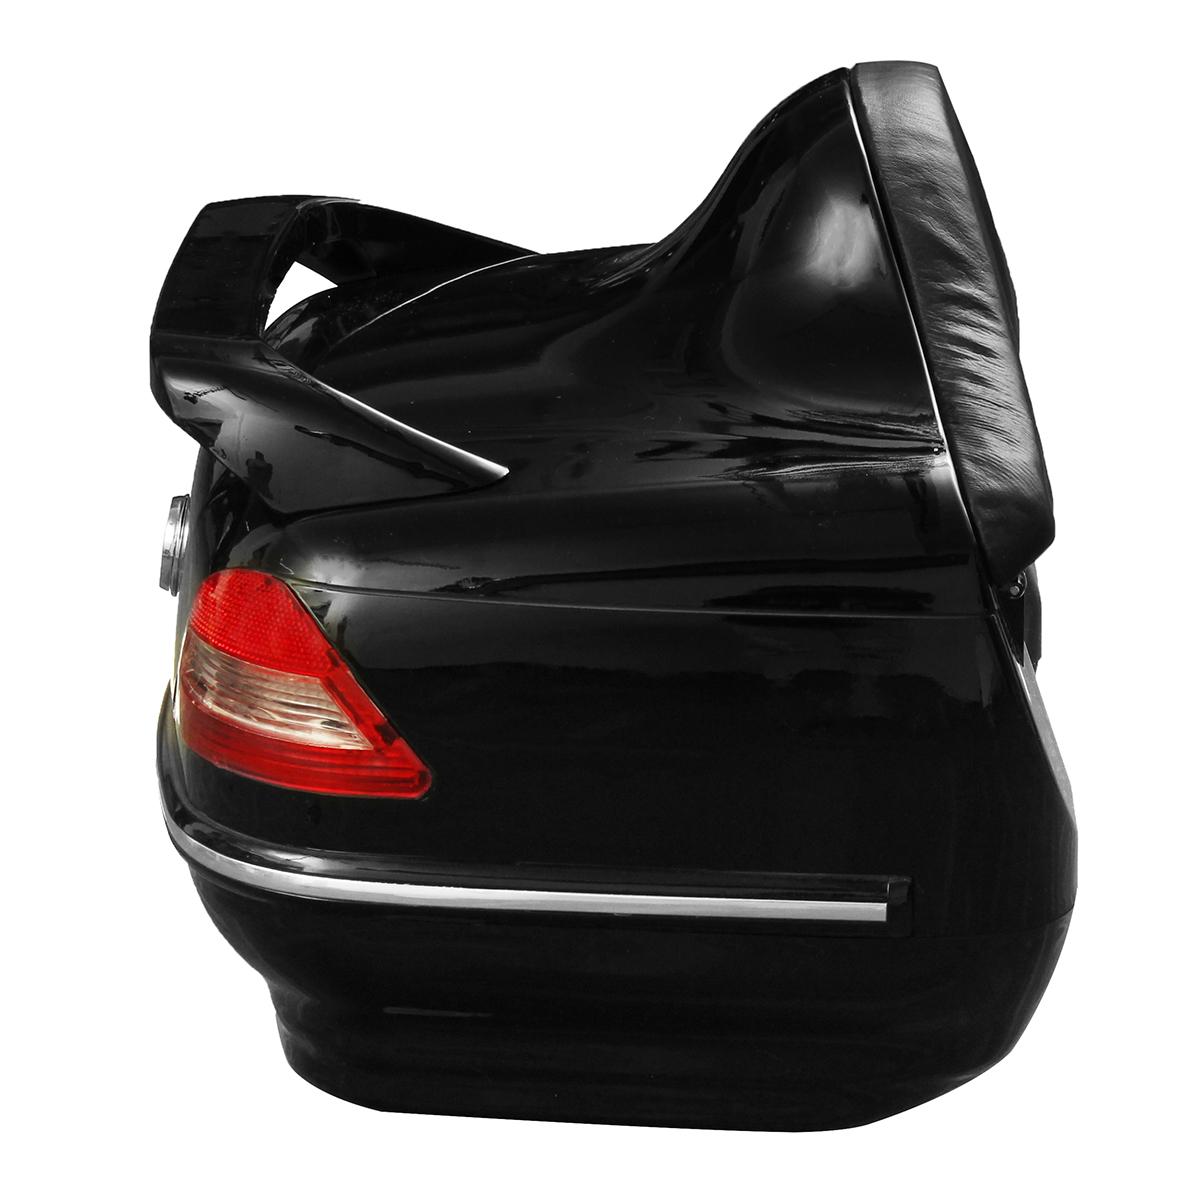 Motorcycle Trunk Tail Box with Taillight Black For Harley/Honda/Yamaha/Suzuki Vulcan Cruiser